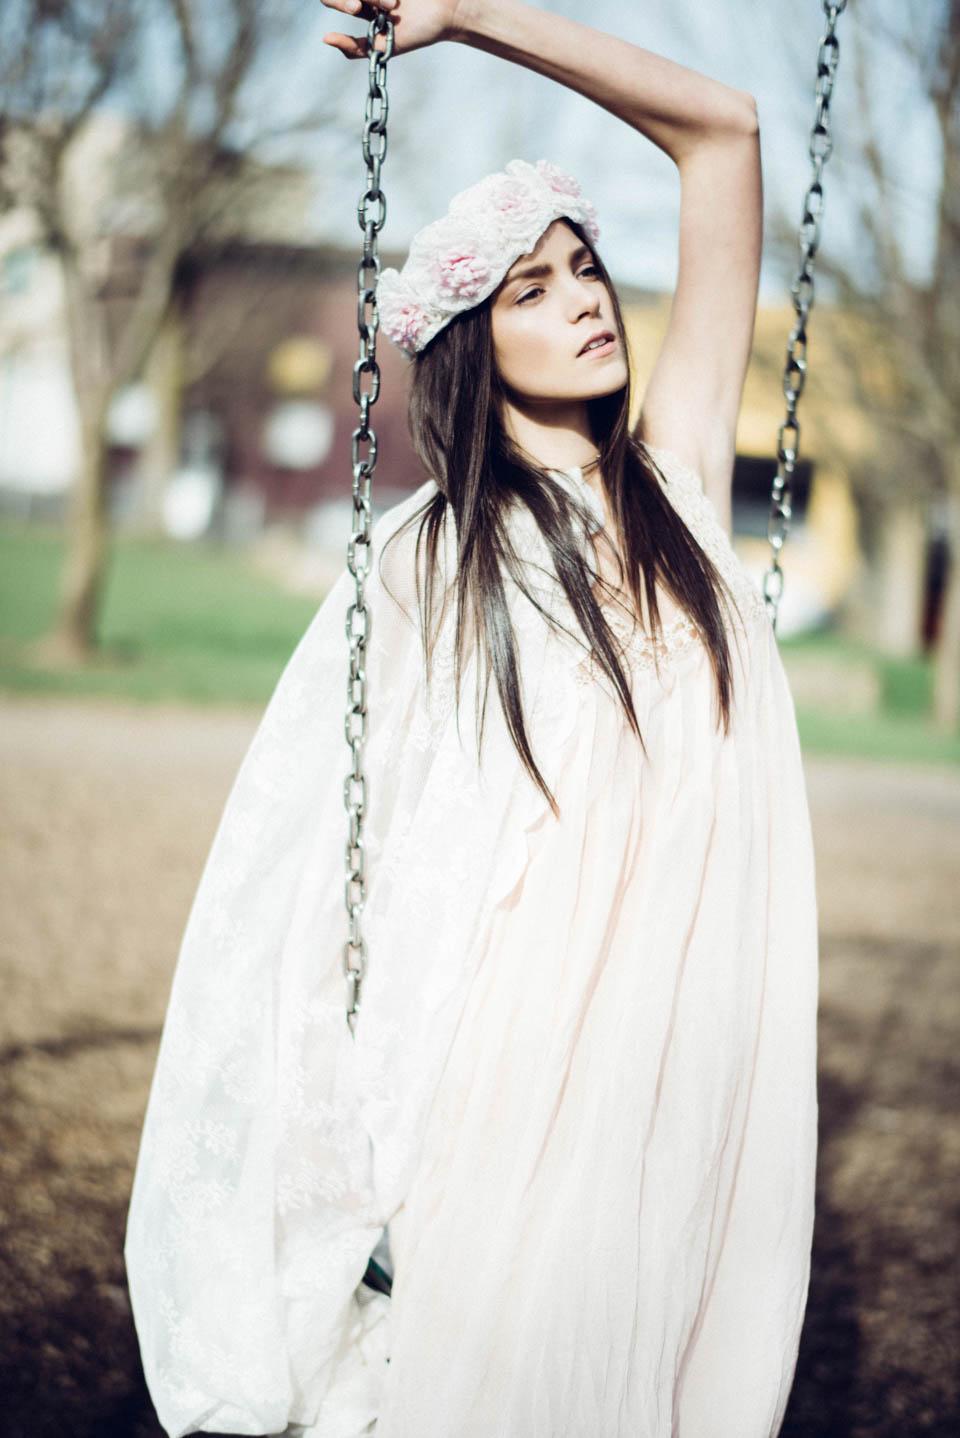 fashion editorial for jute shot in portland by fashion photographer erika astrid_45.jpg